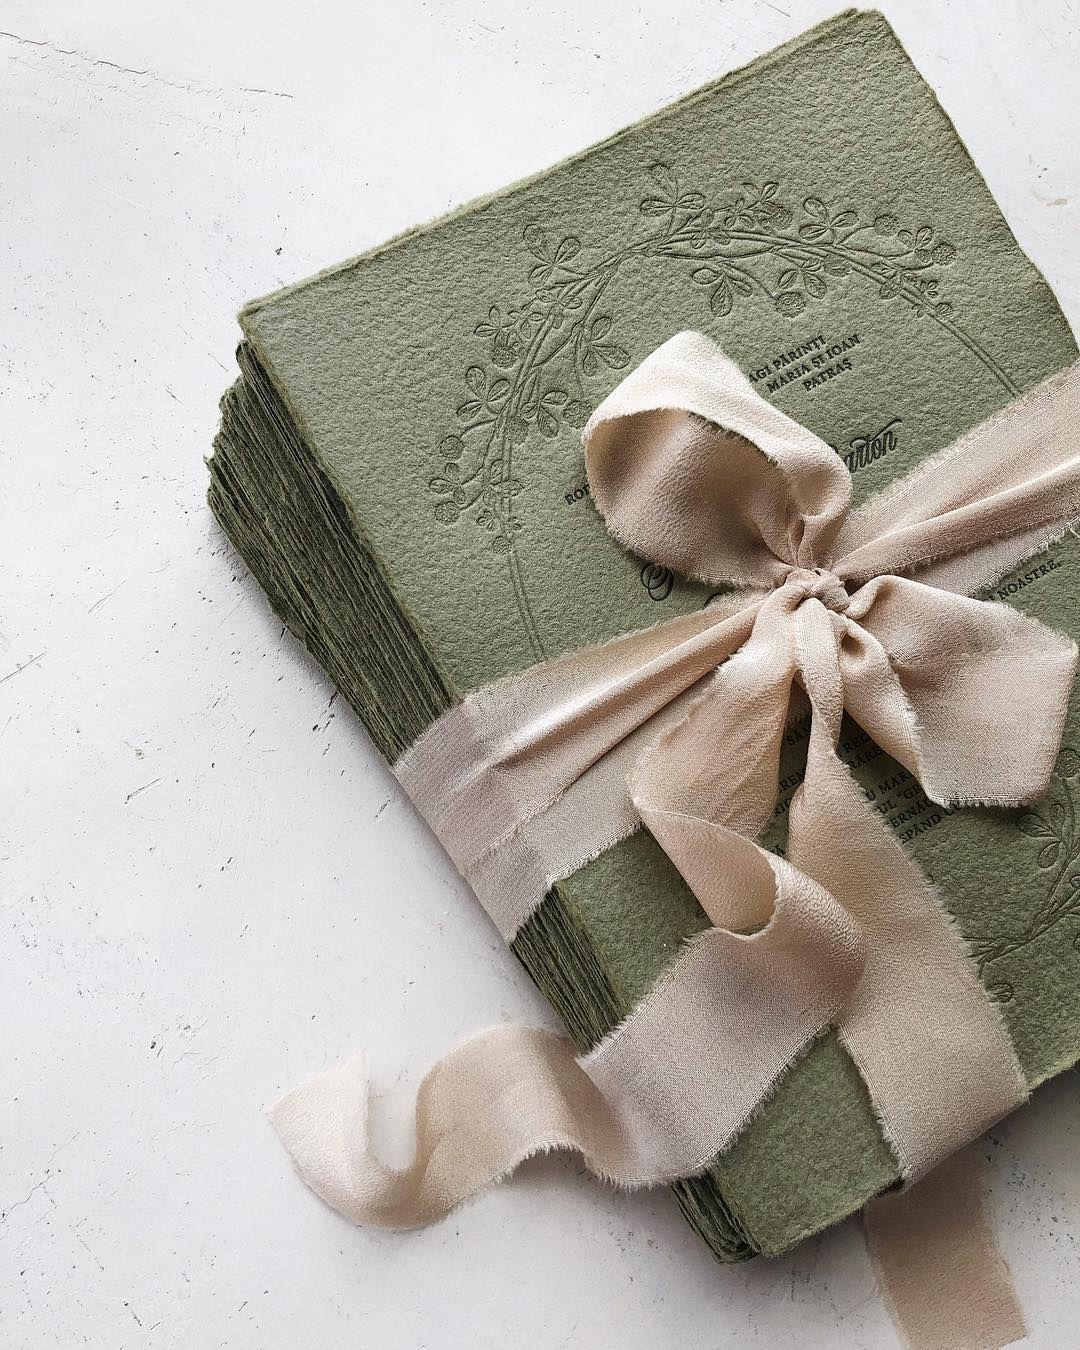 Matchy Matchy Letterpress Invite And Handmade Envelope: Greenery Letterpress Handmade Paper Wedding Invitations